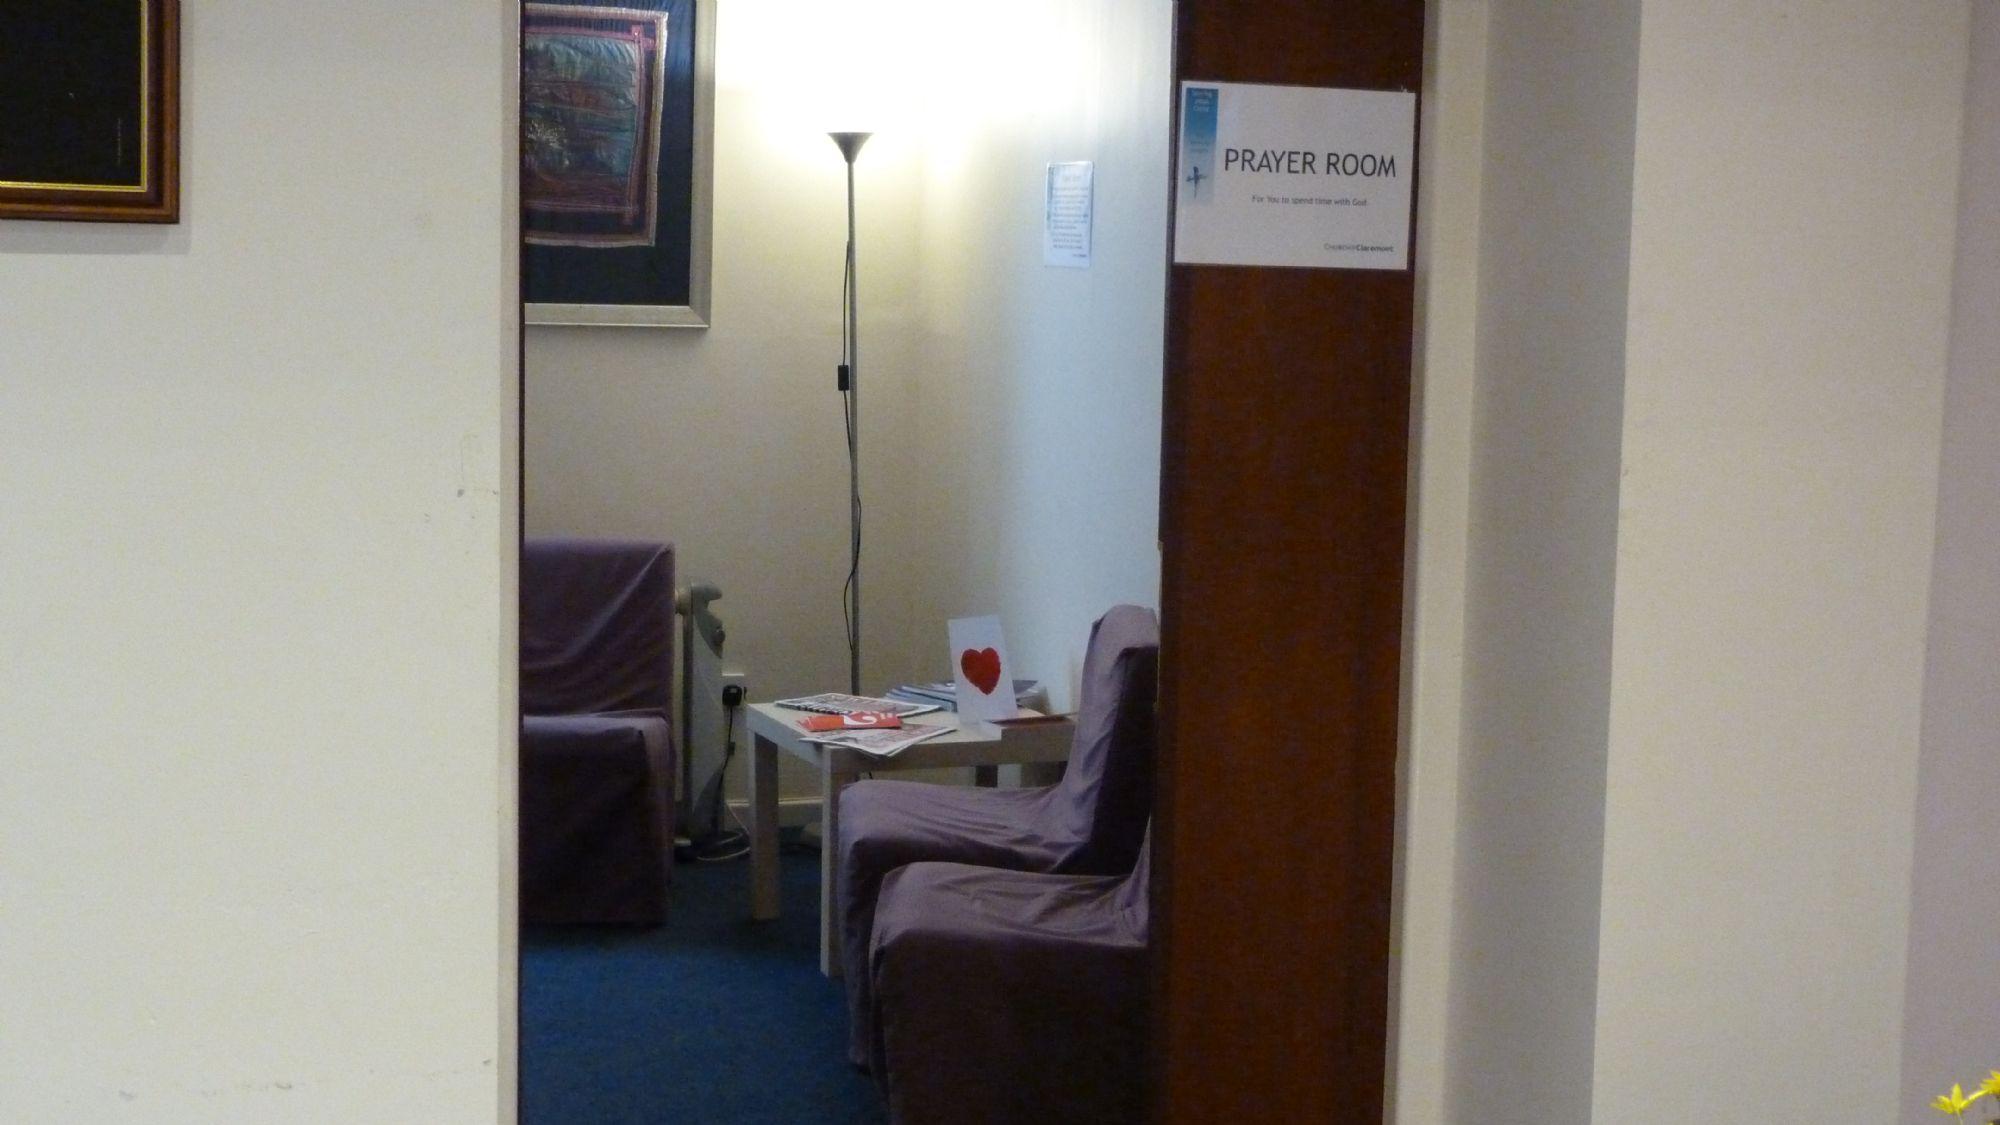 Claremont Prayer Room